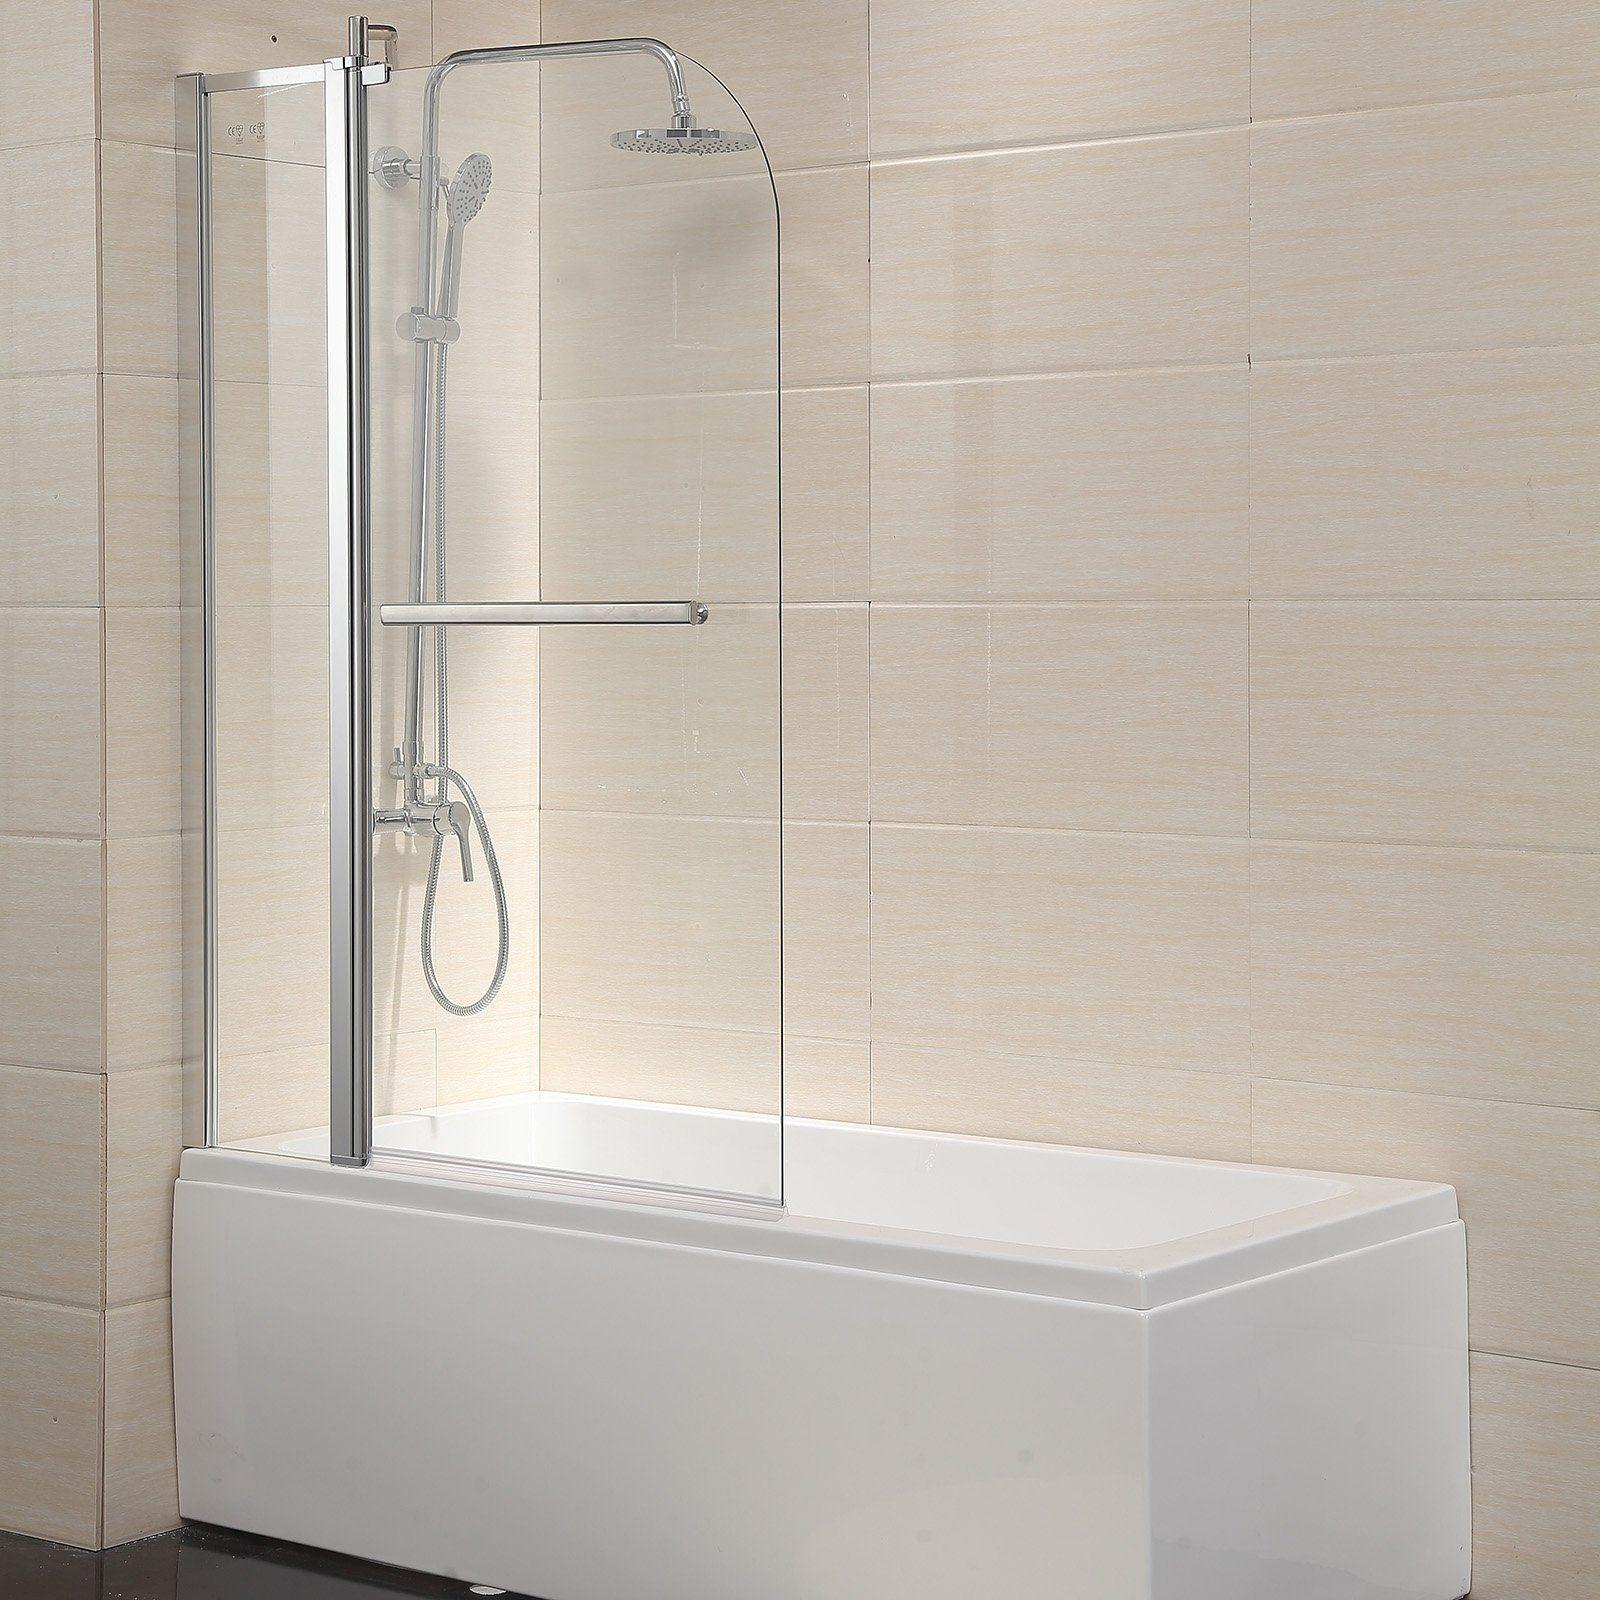 Waagee Bath Tub Shower Door Framed 14 Clear Glass 55x39 Home